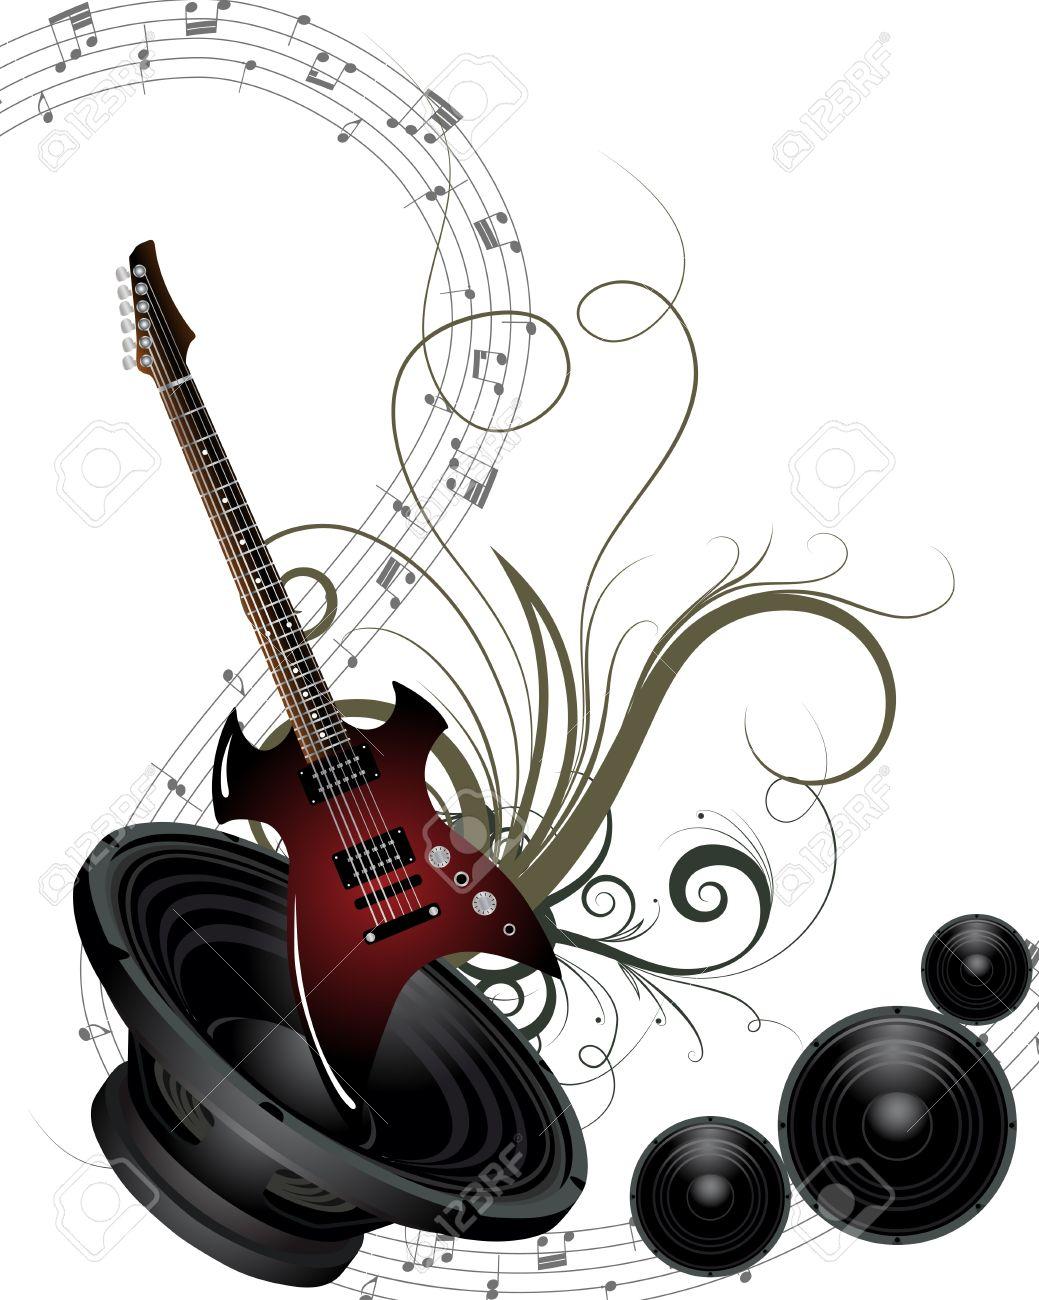 Enchanting Musical Picture Frame Sketch - Ideas de Marcos ...